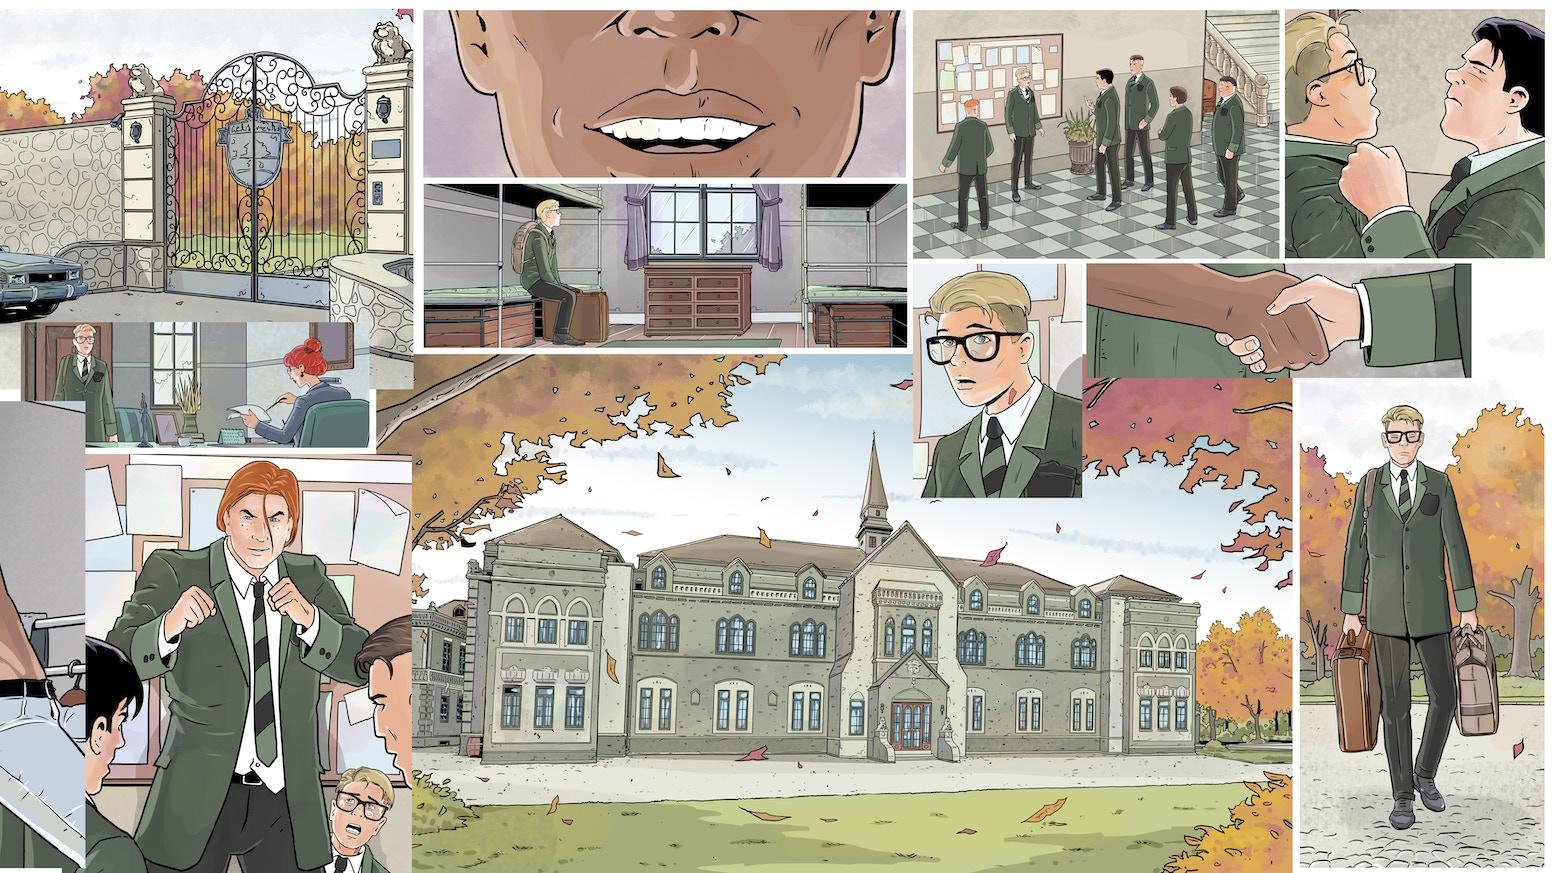 BROTHERHOOD: A NEW exciting Superhero LGBTQ Comicbook Series by